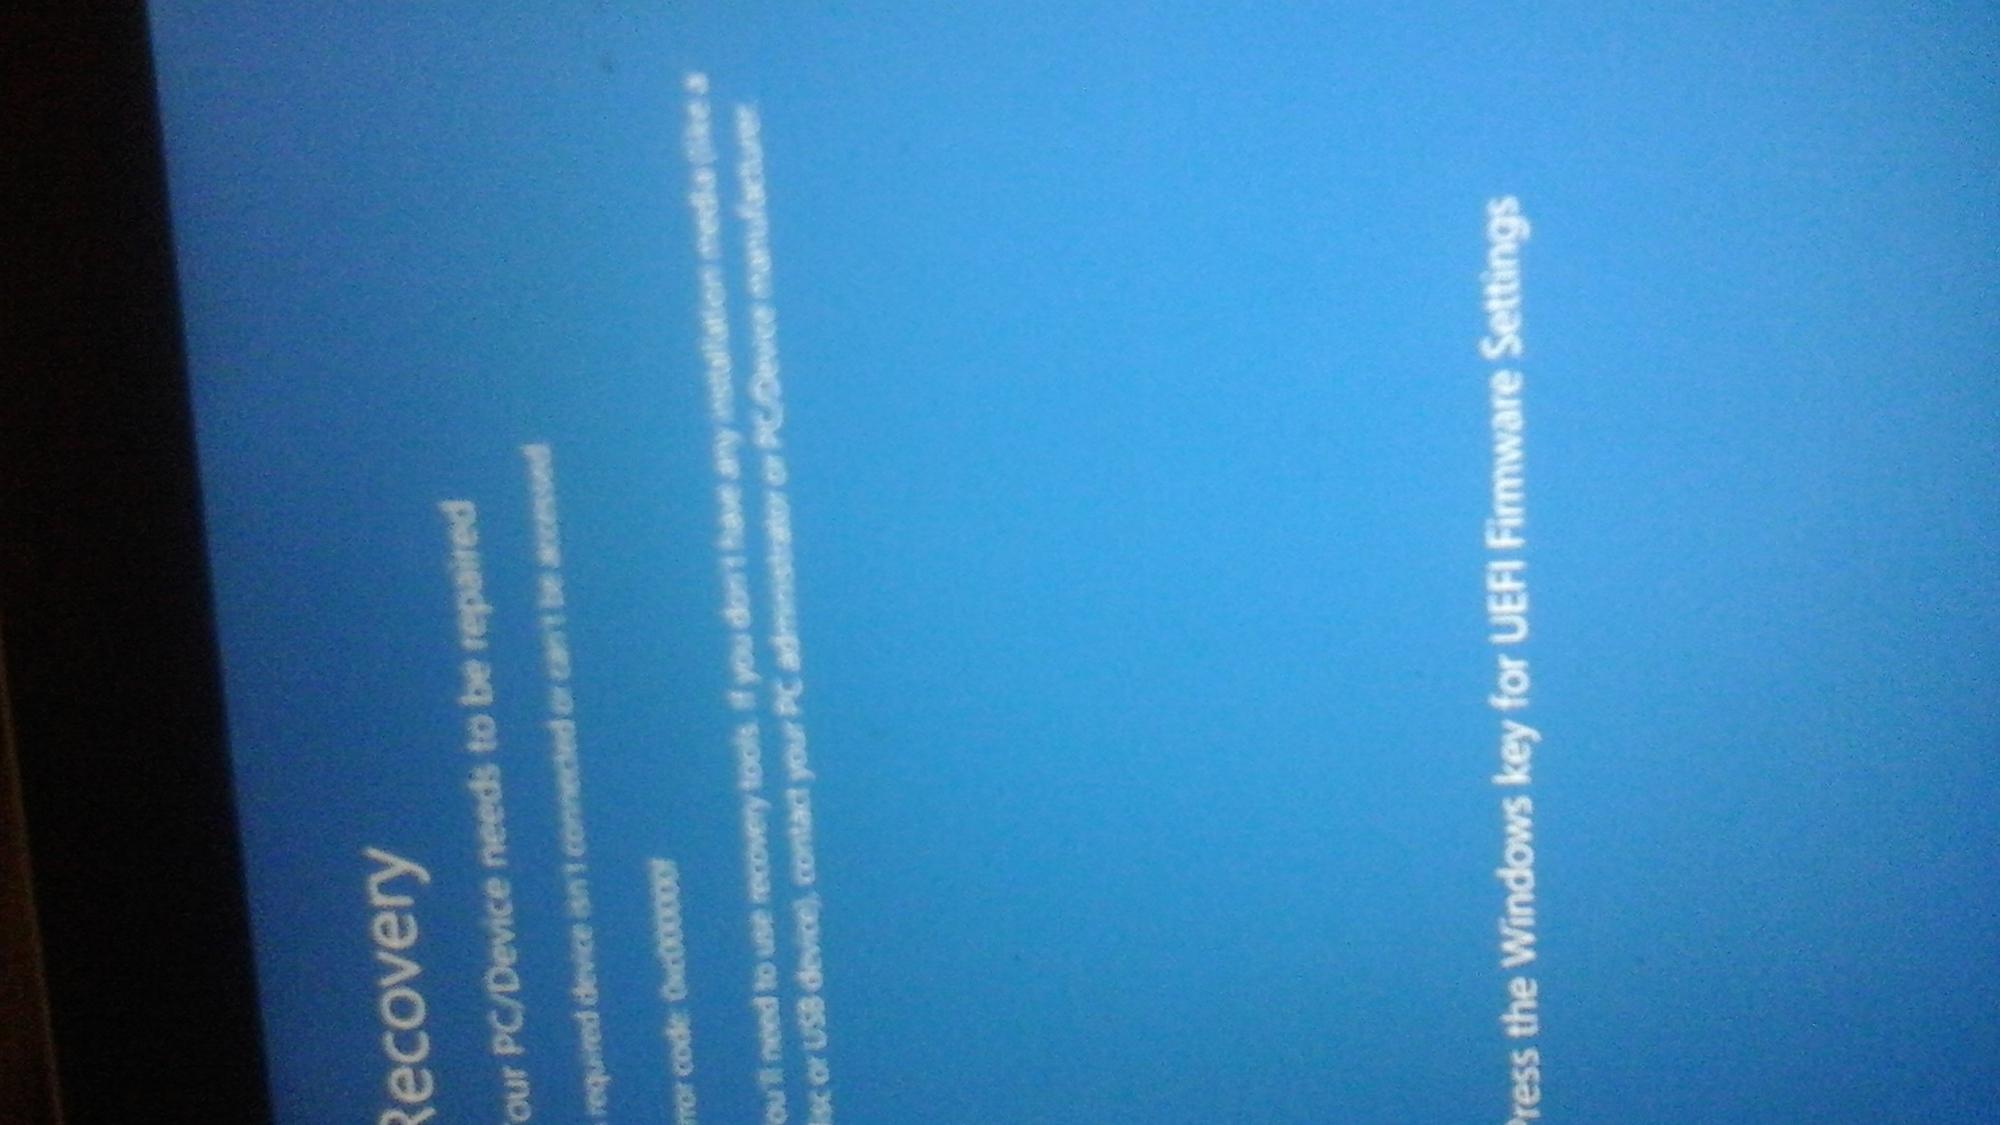 Error code 9a6bbf64-0c85-4ceb-8f4f-a6becaf56c22?upload=true.jpg